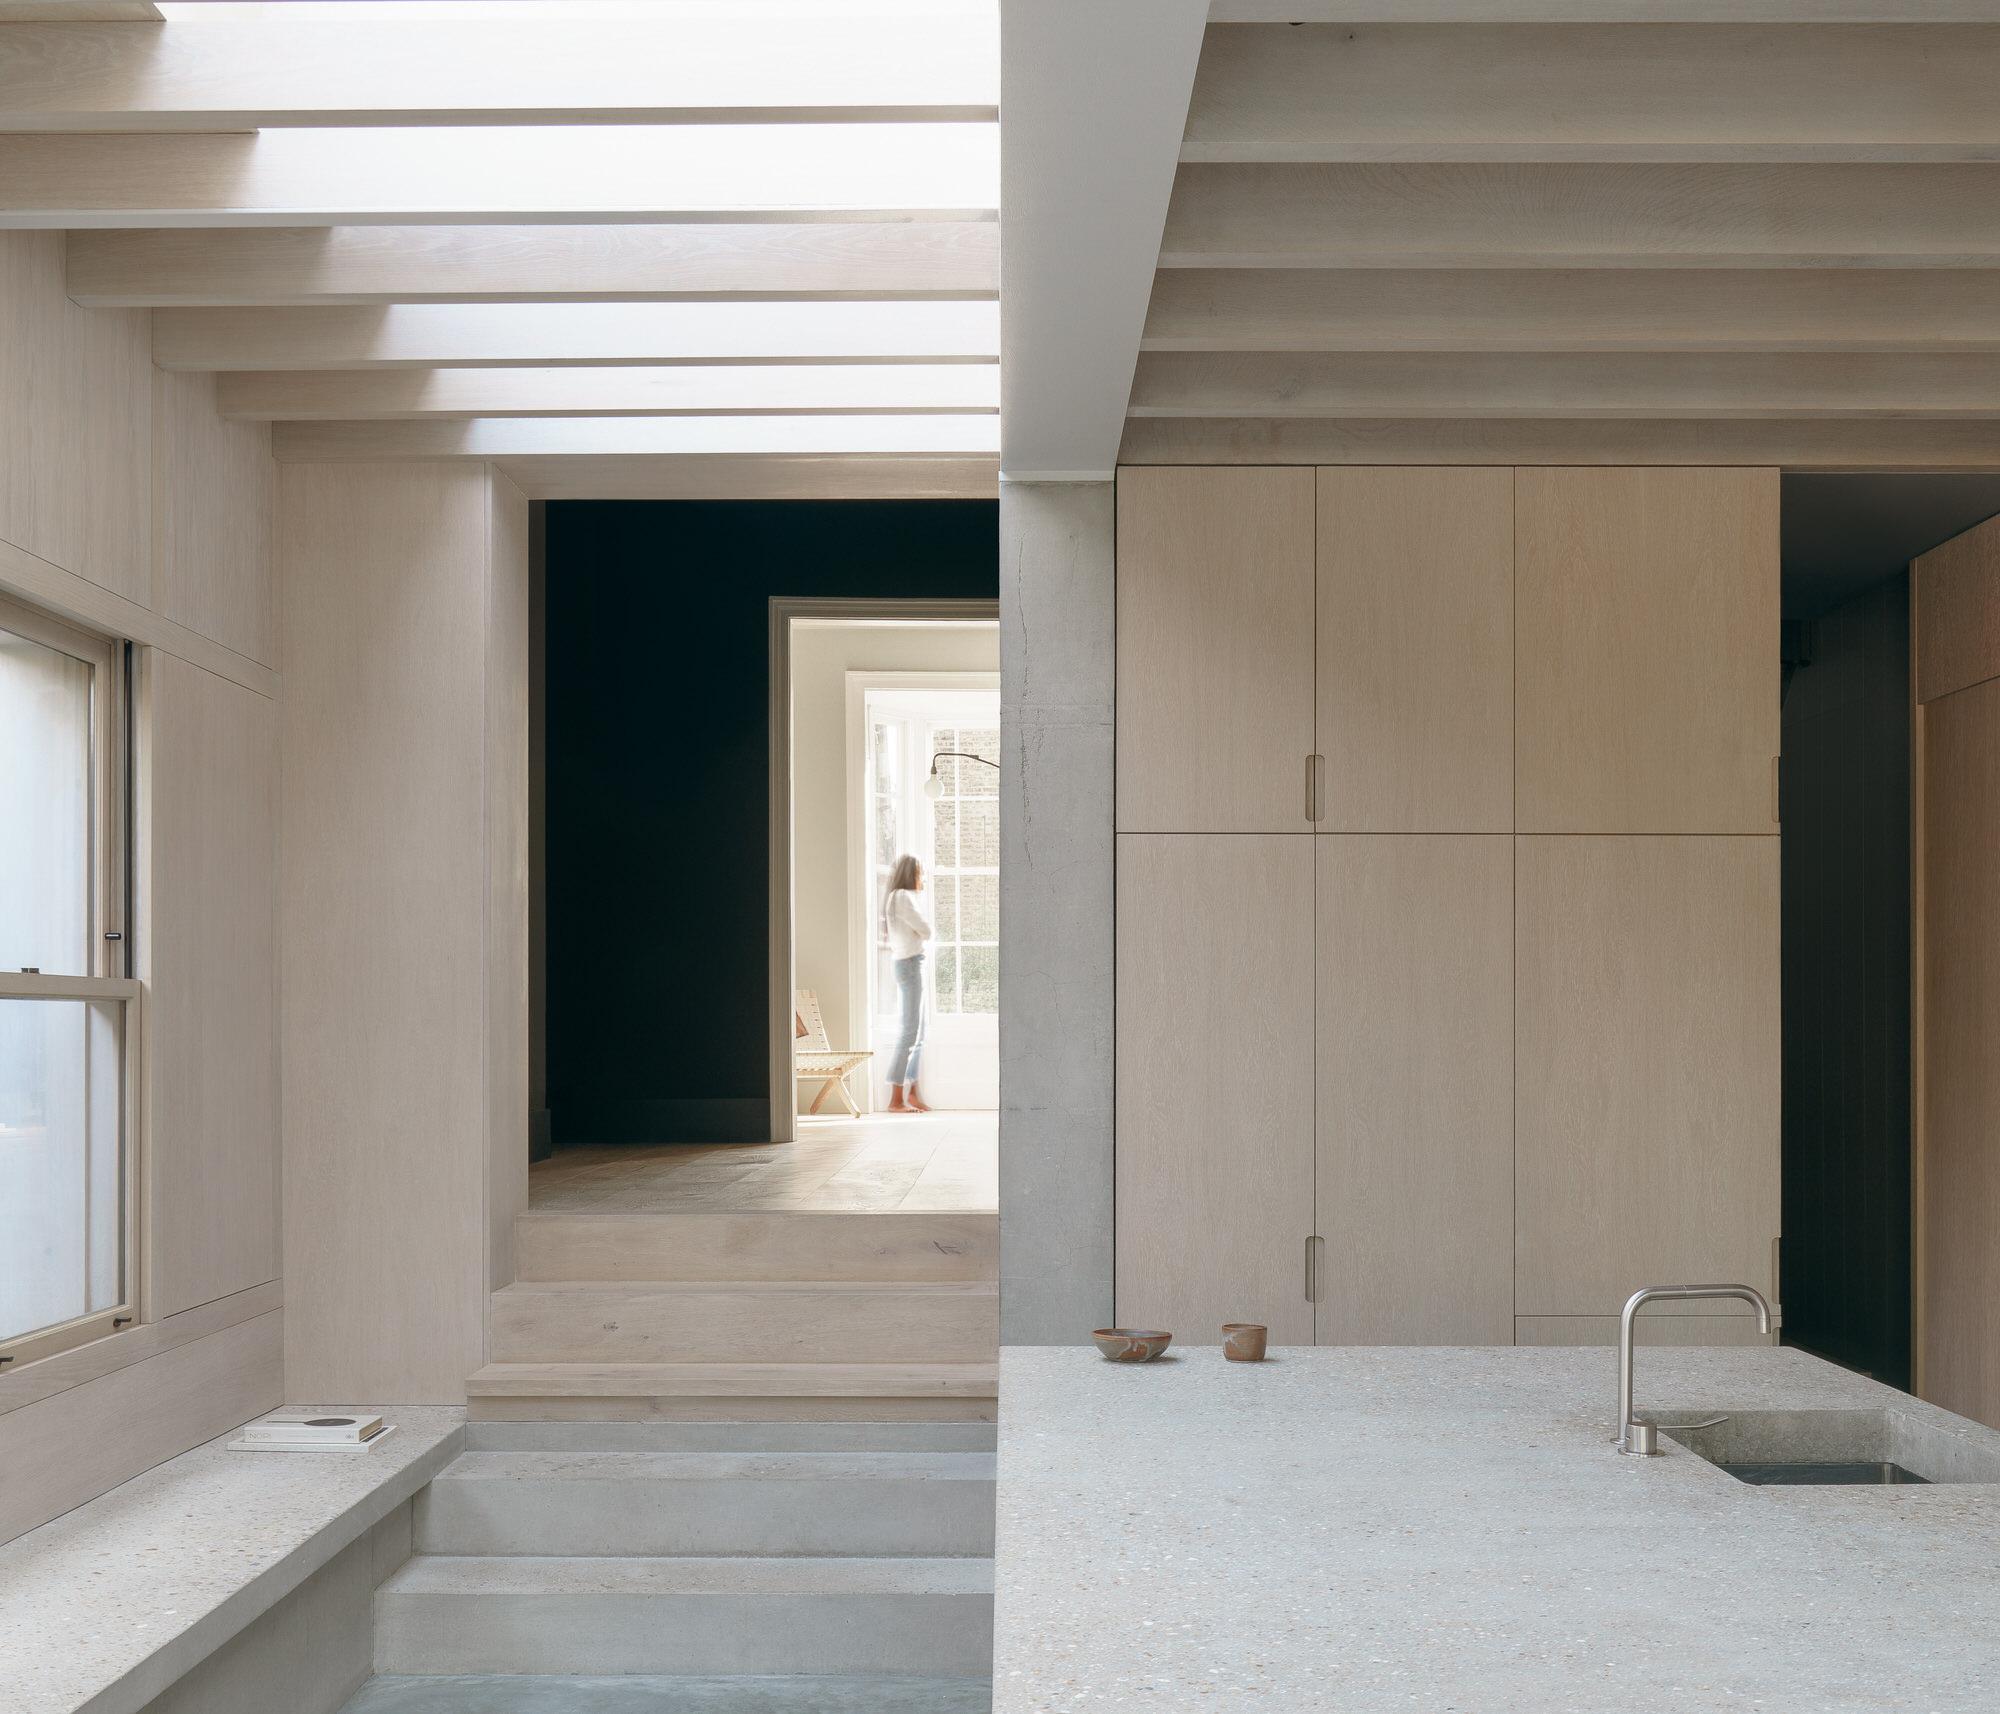 Dgn Studio Concrete Plinth House East London Residential Architecture Photo Nick Dearden Yellowtrace 14